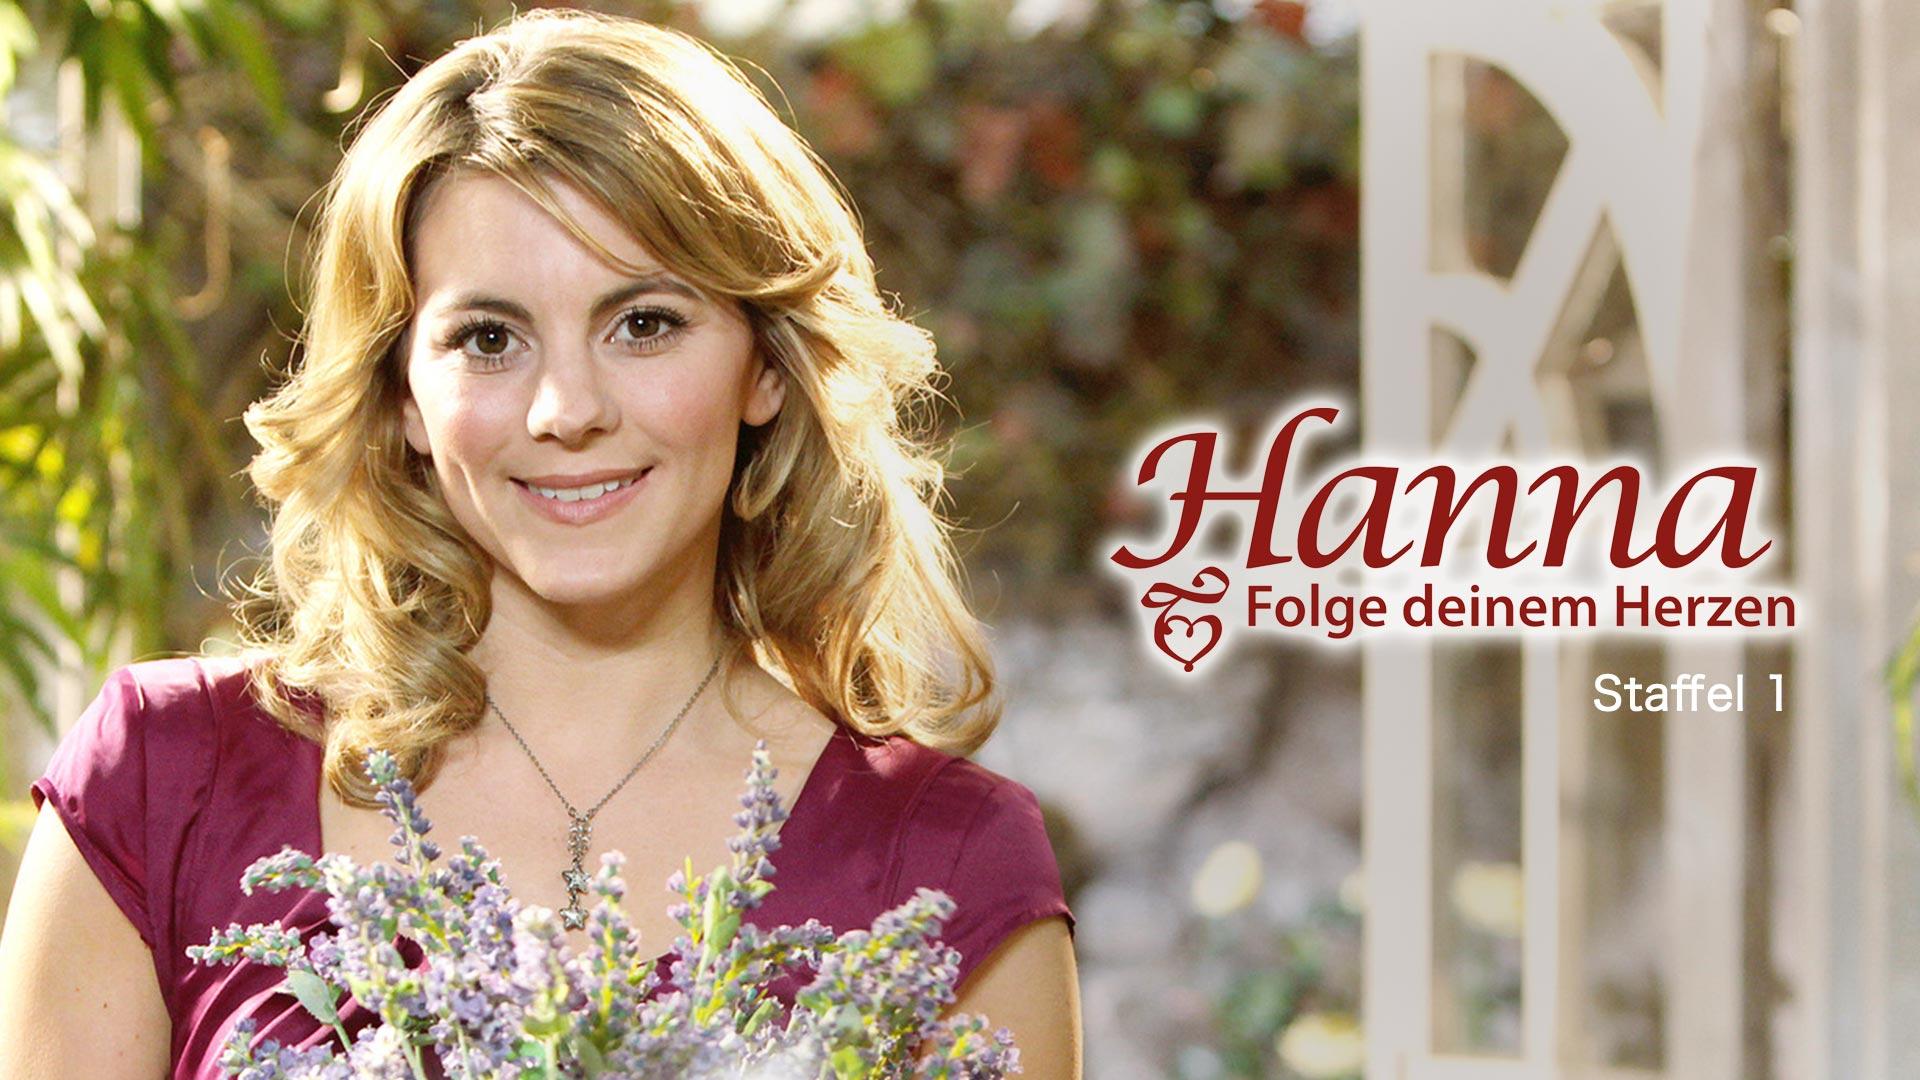 Hanna - Folge deinem Herzen, Staffel 1